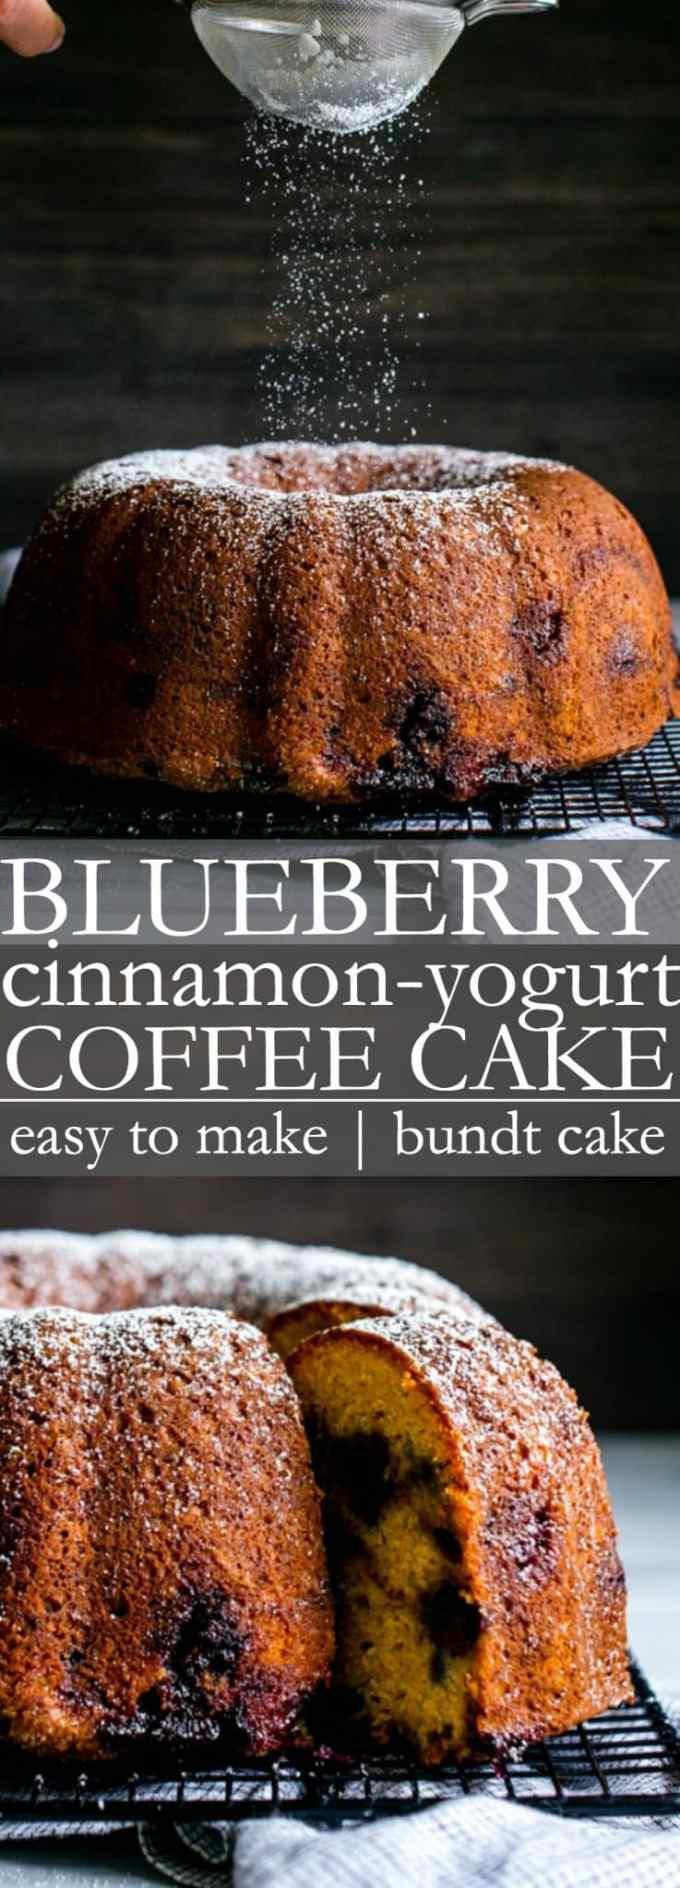 Blueberry Cinnamon Yogurt Coffee Cake